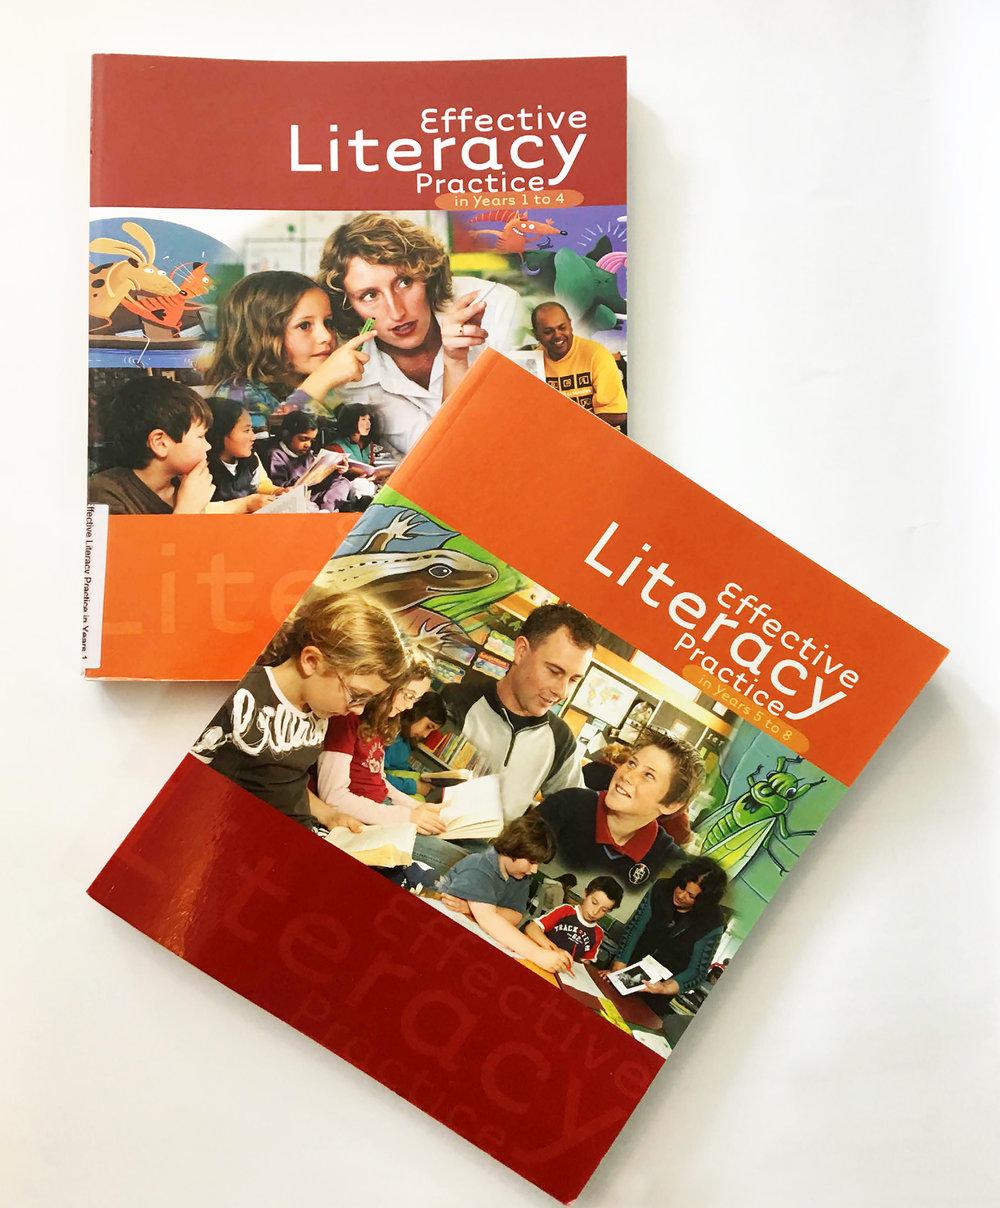 CSNS_effective-literacy1.jpg